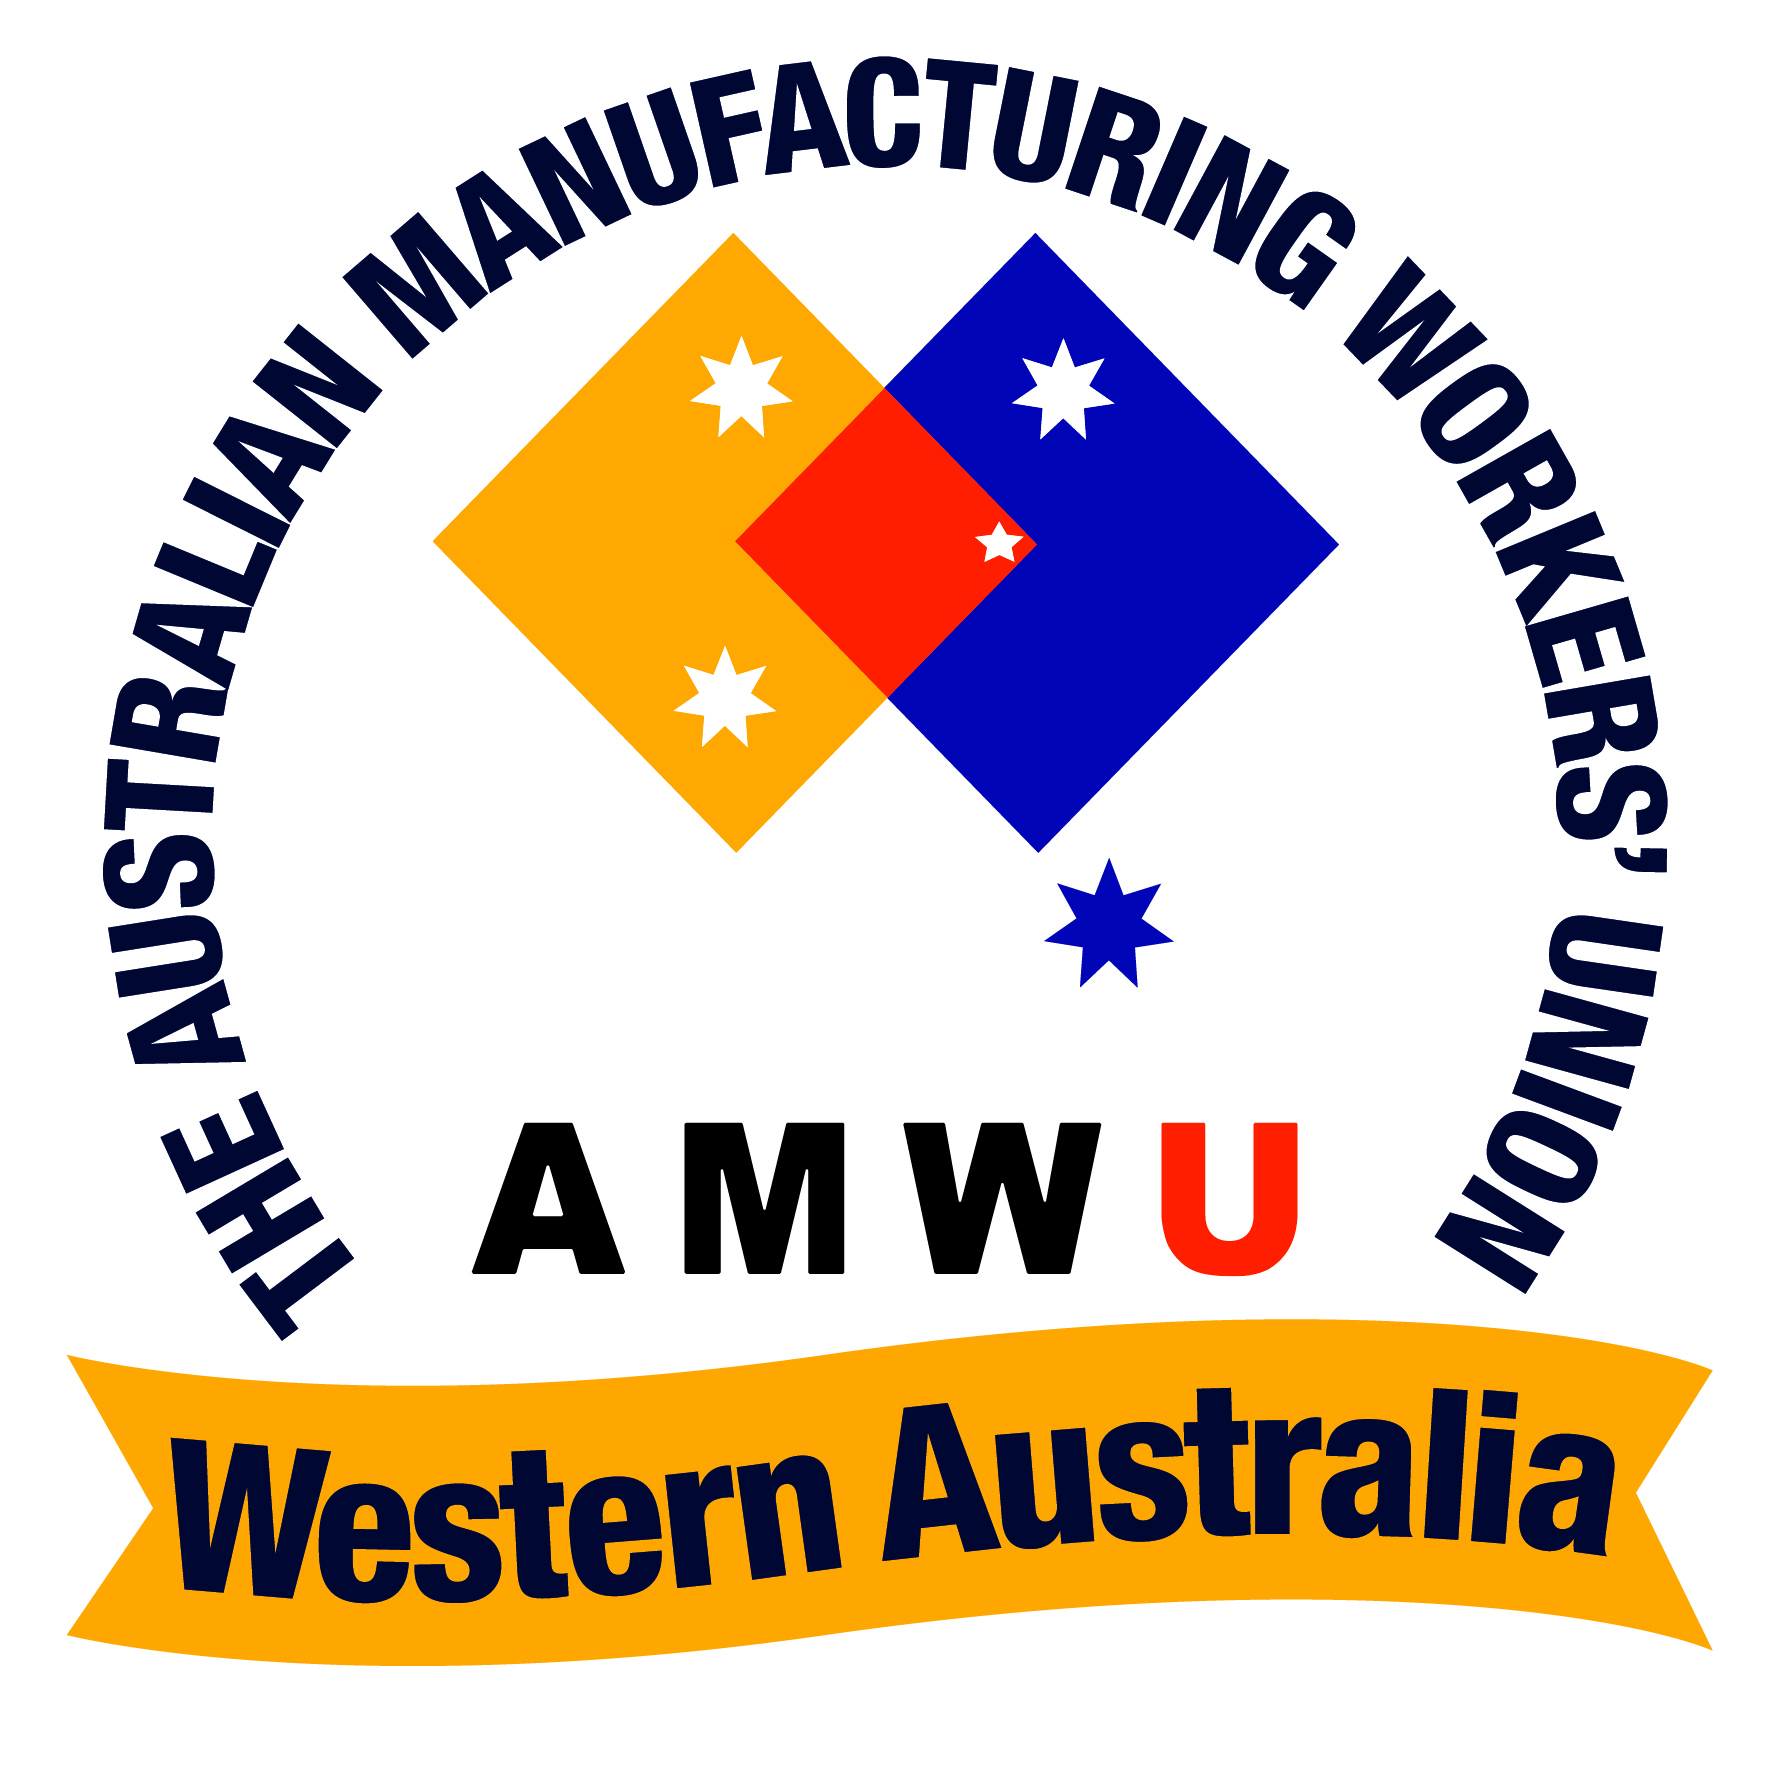 AMWU_WA_State_Logo_v_3_white_background.jpg